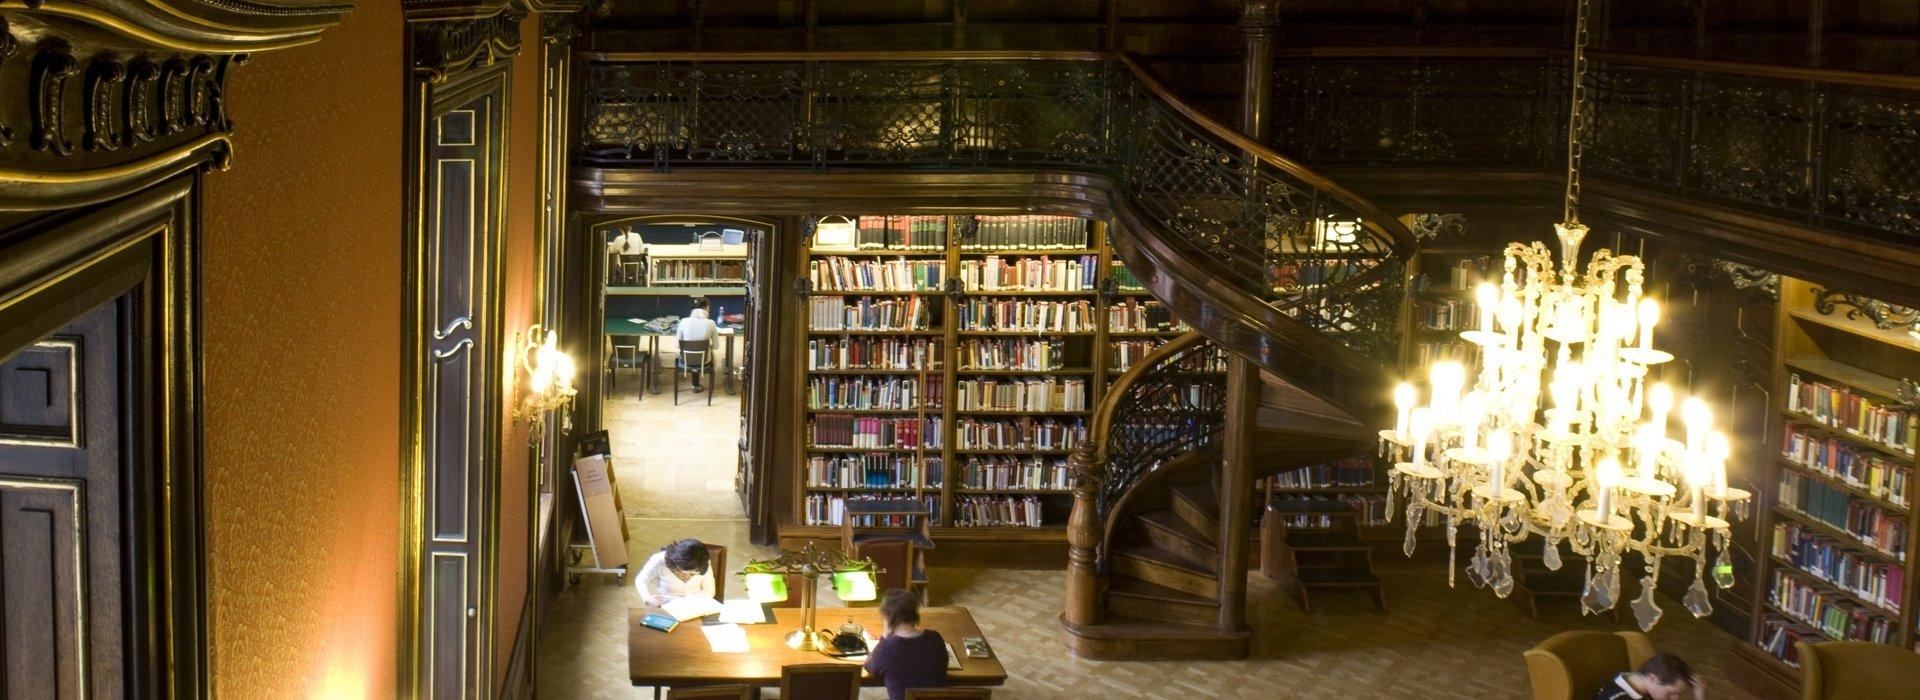 Széchenyi Nationalbibliothek